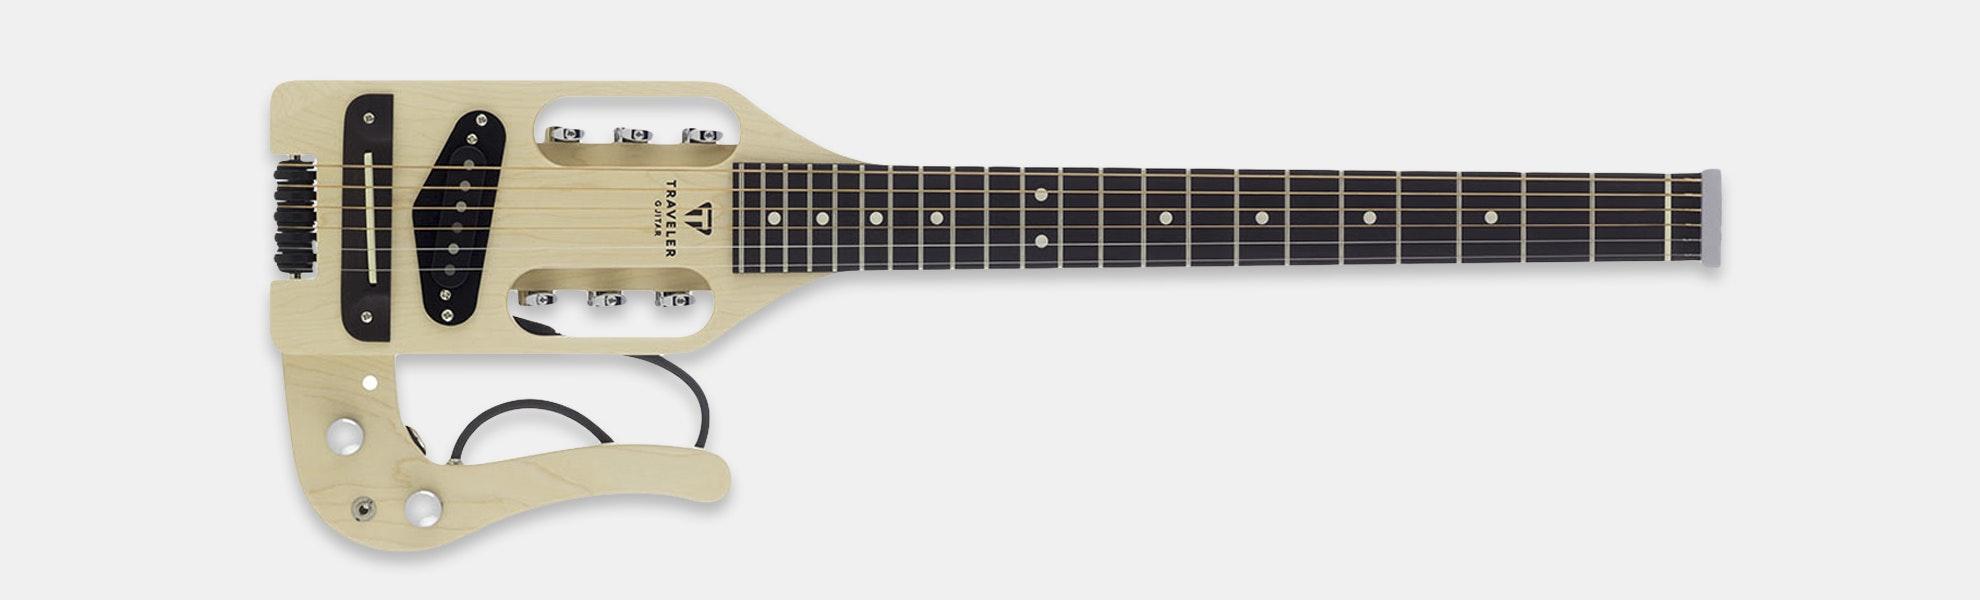 Traveler Guitar Pro-Series B-Stock